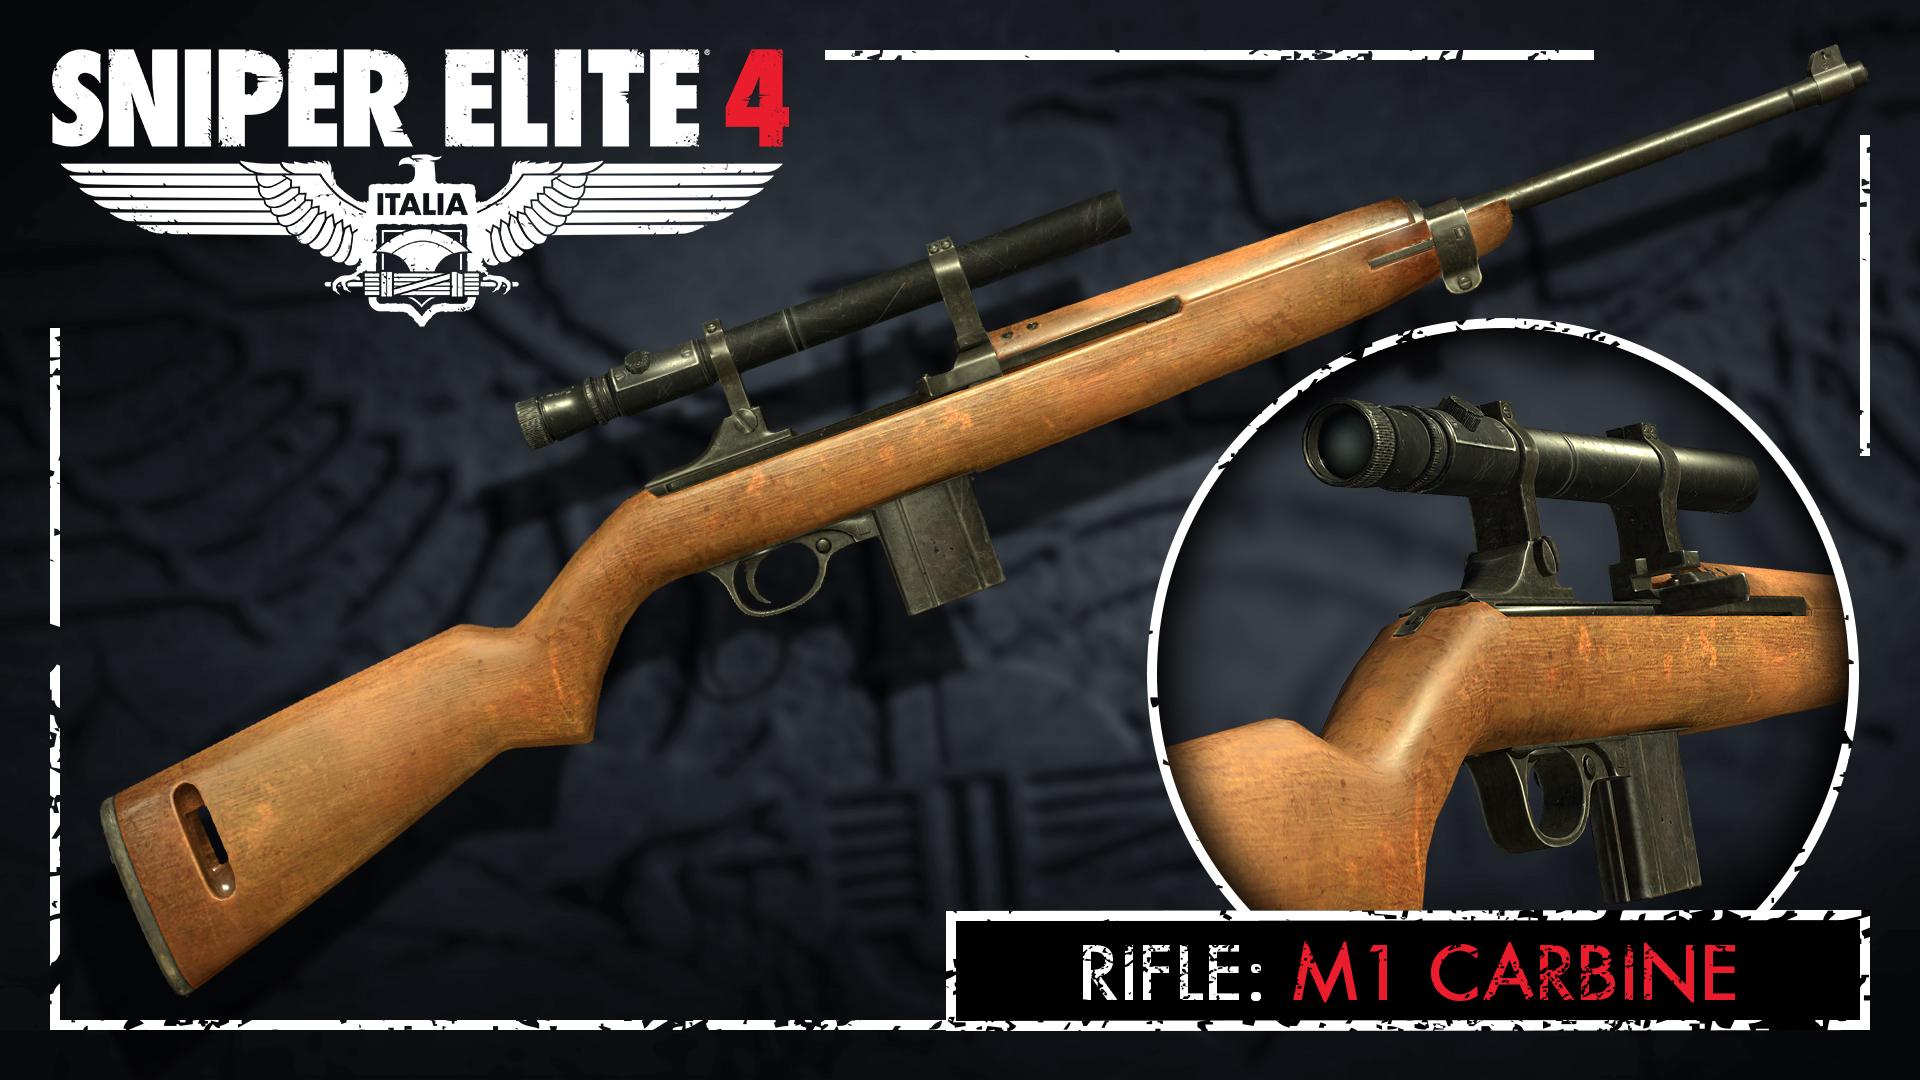 Sniper Elite 4 - Allied Forces Rifle Pack screenshot